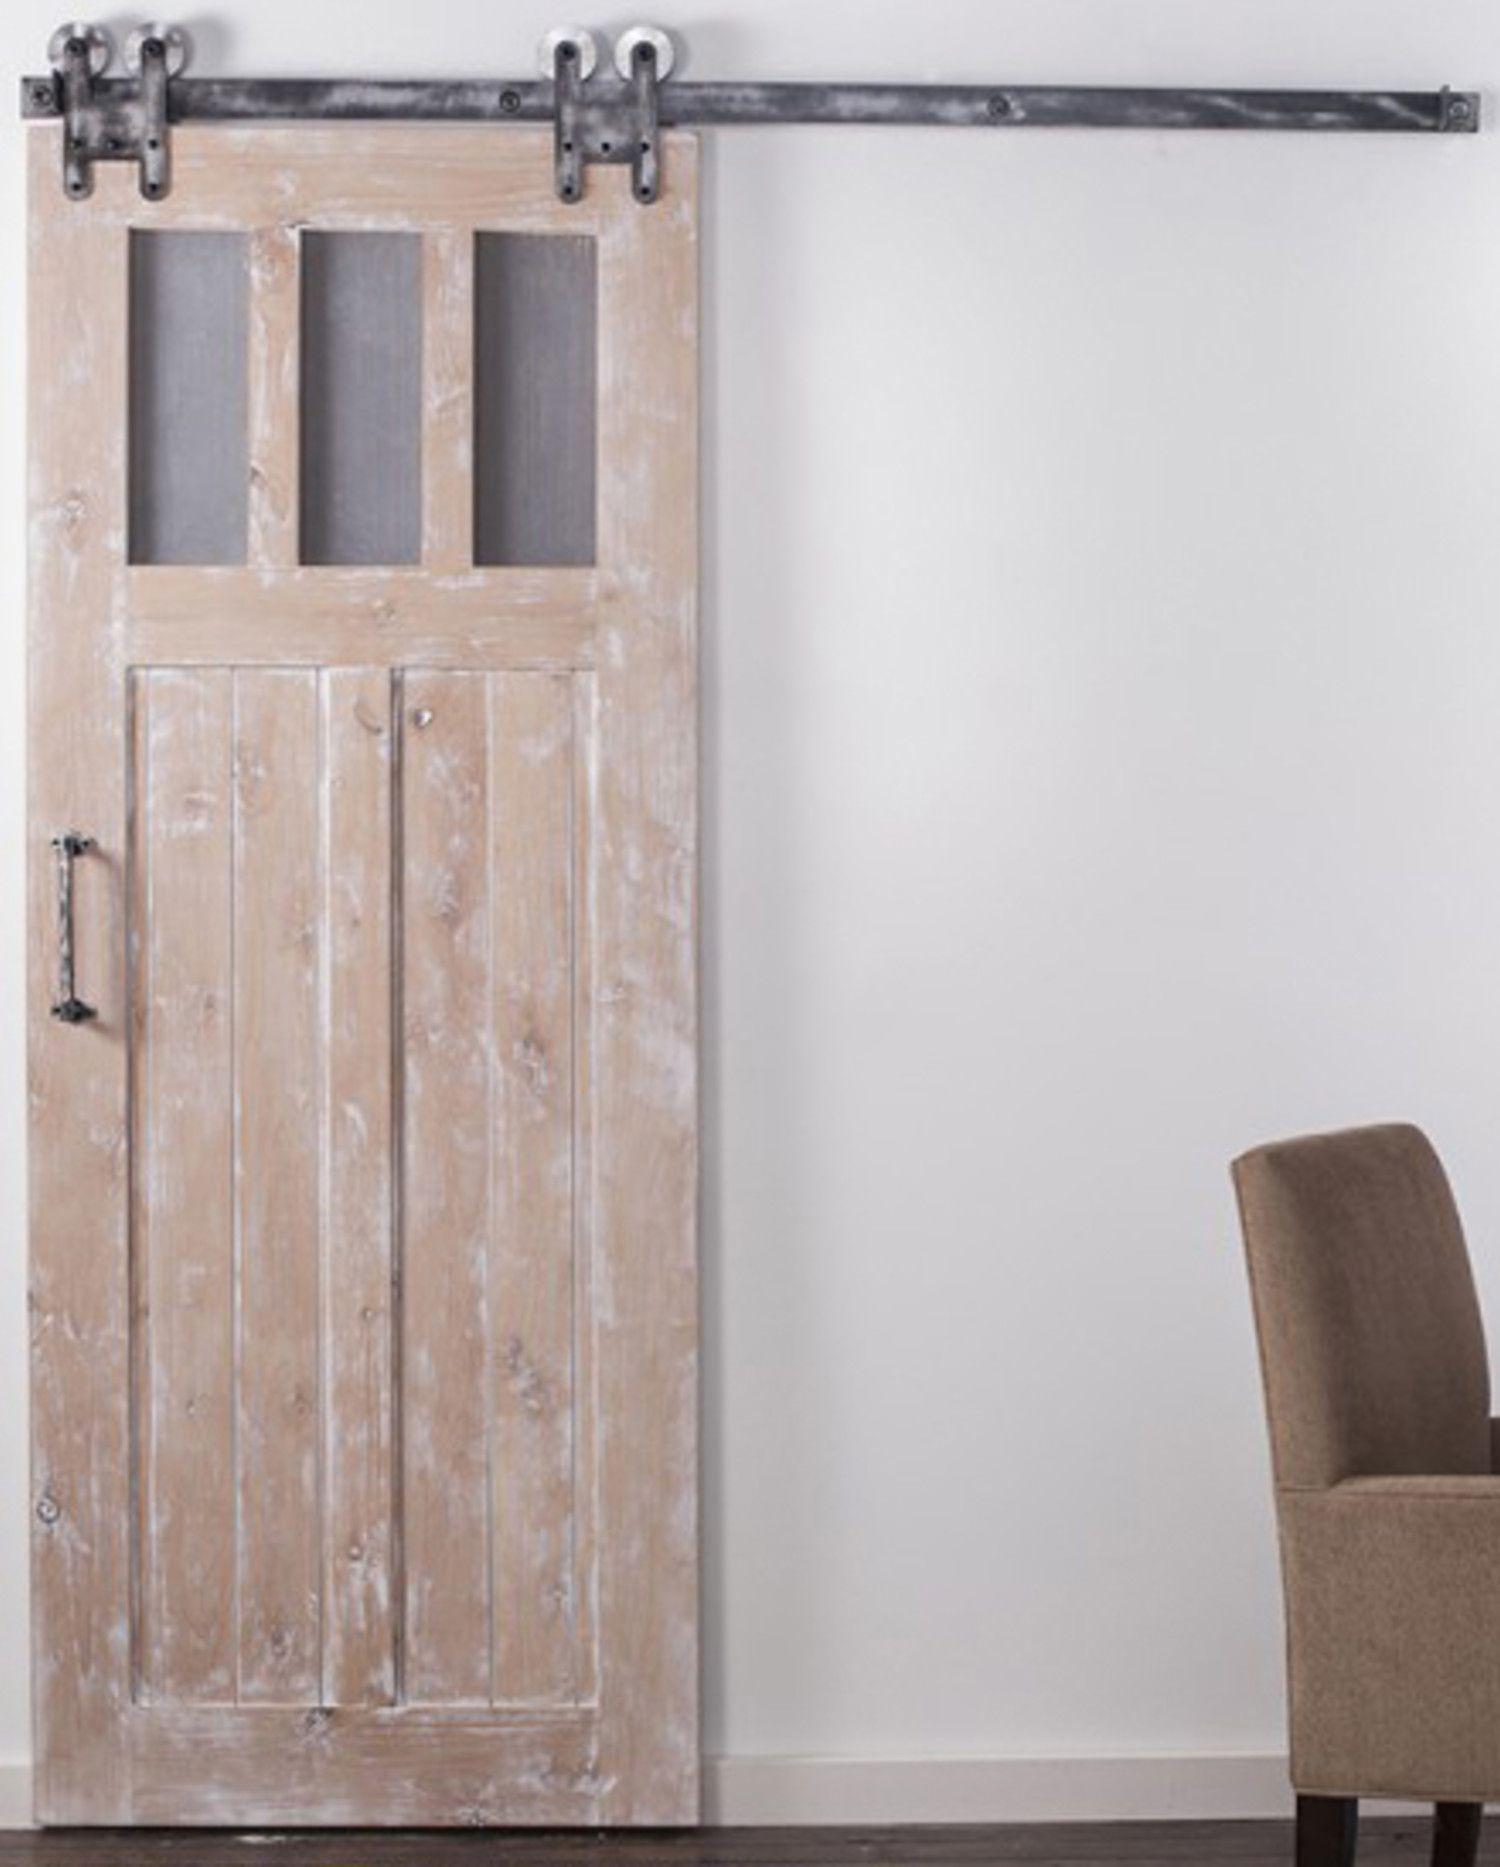 Interior Sliding Craftsman Barn Door Rustica Hardware Sliding Doors Interior Barn Doors Sliding Sliding Mirror Closet Doors